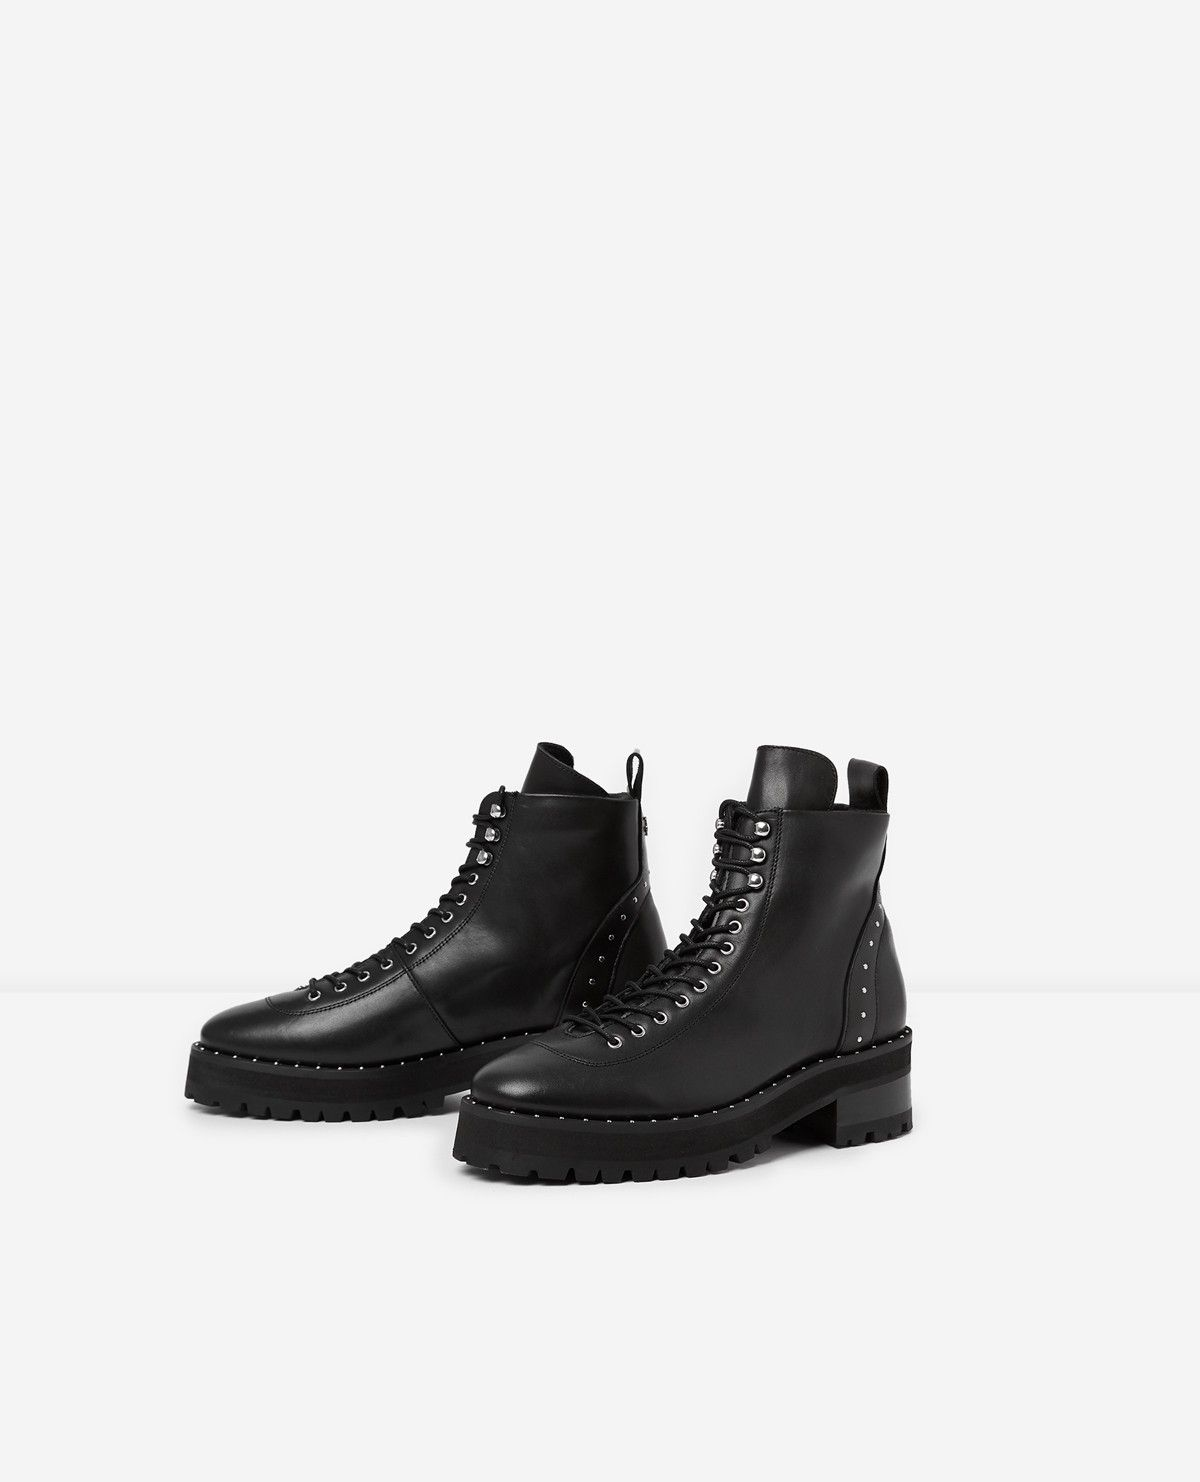 2019Soldes noir cuir BUYen lacéesTO Bottines N0Ovwm8n